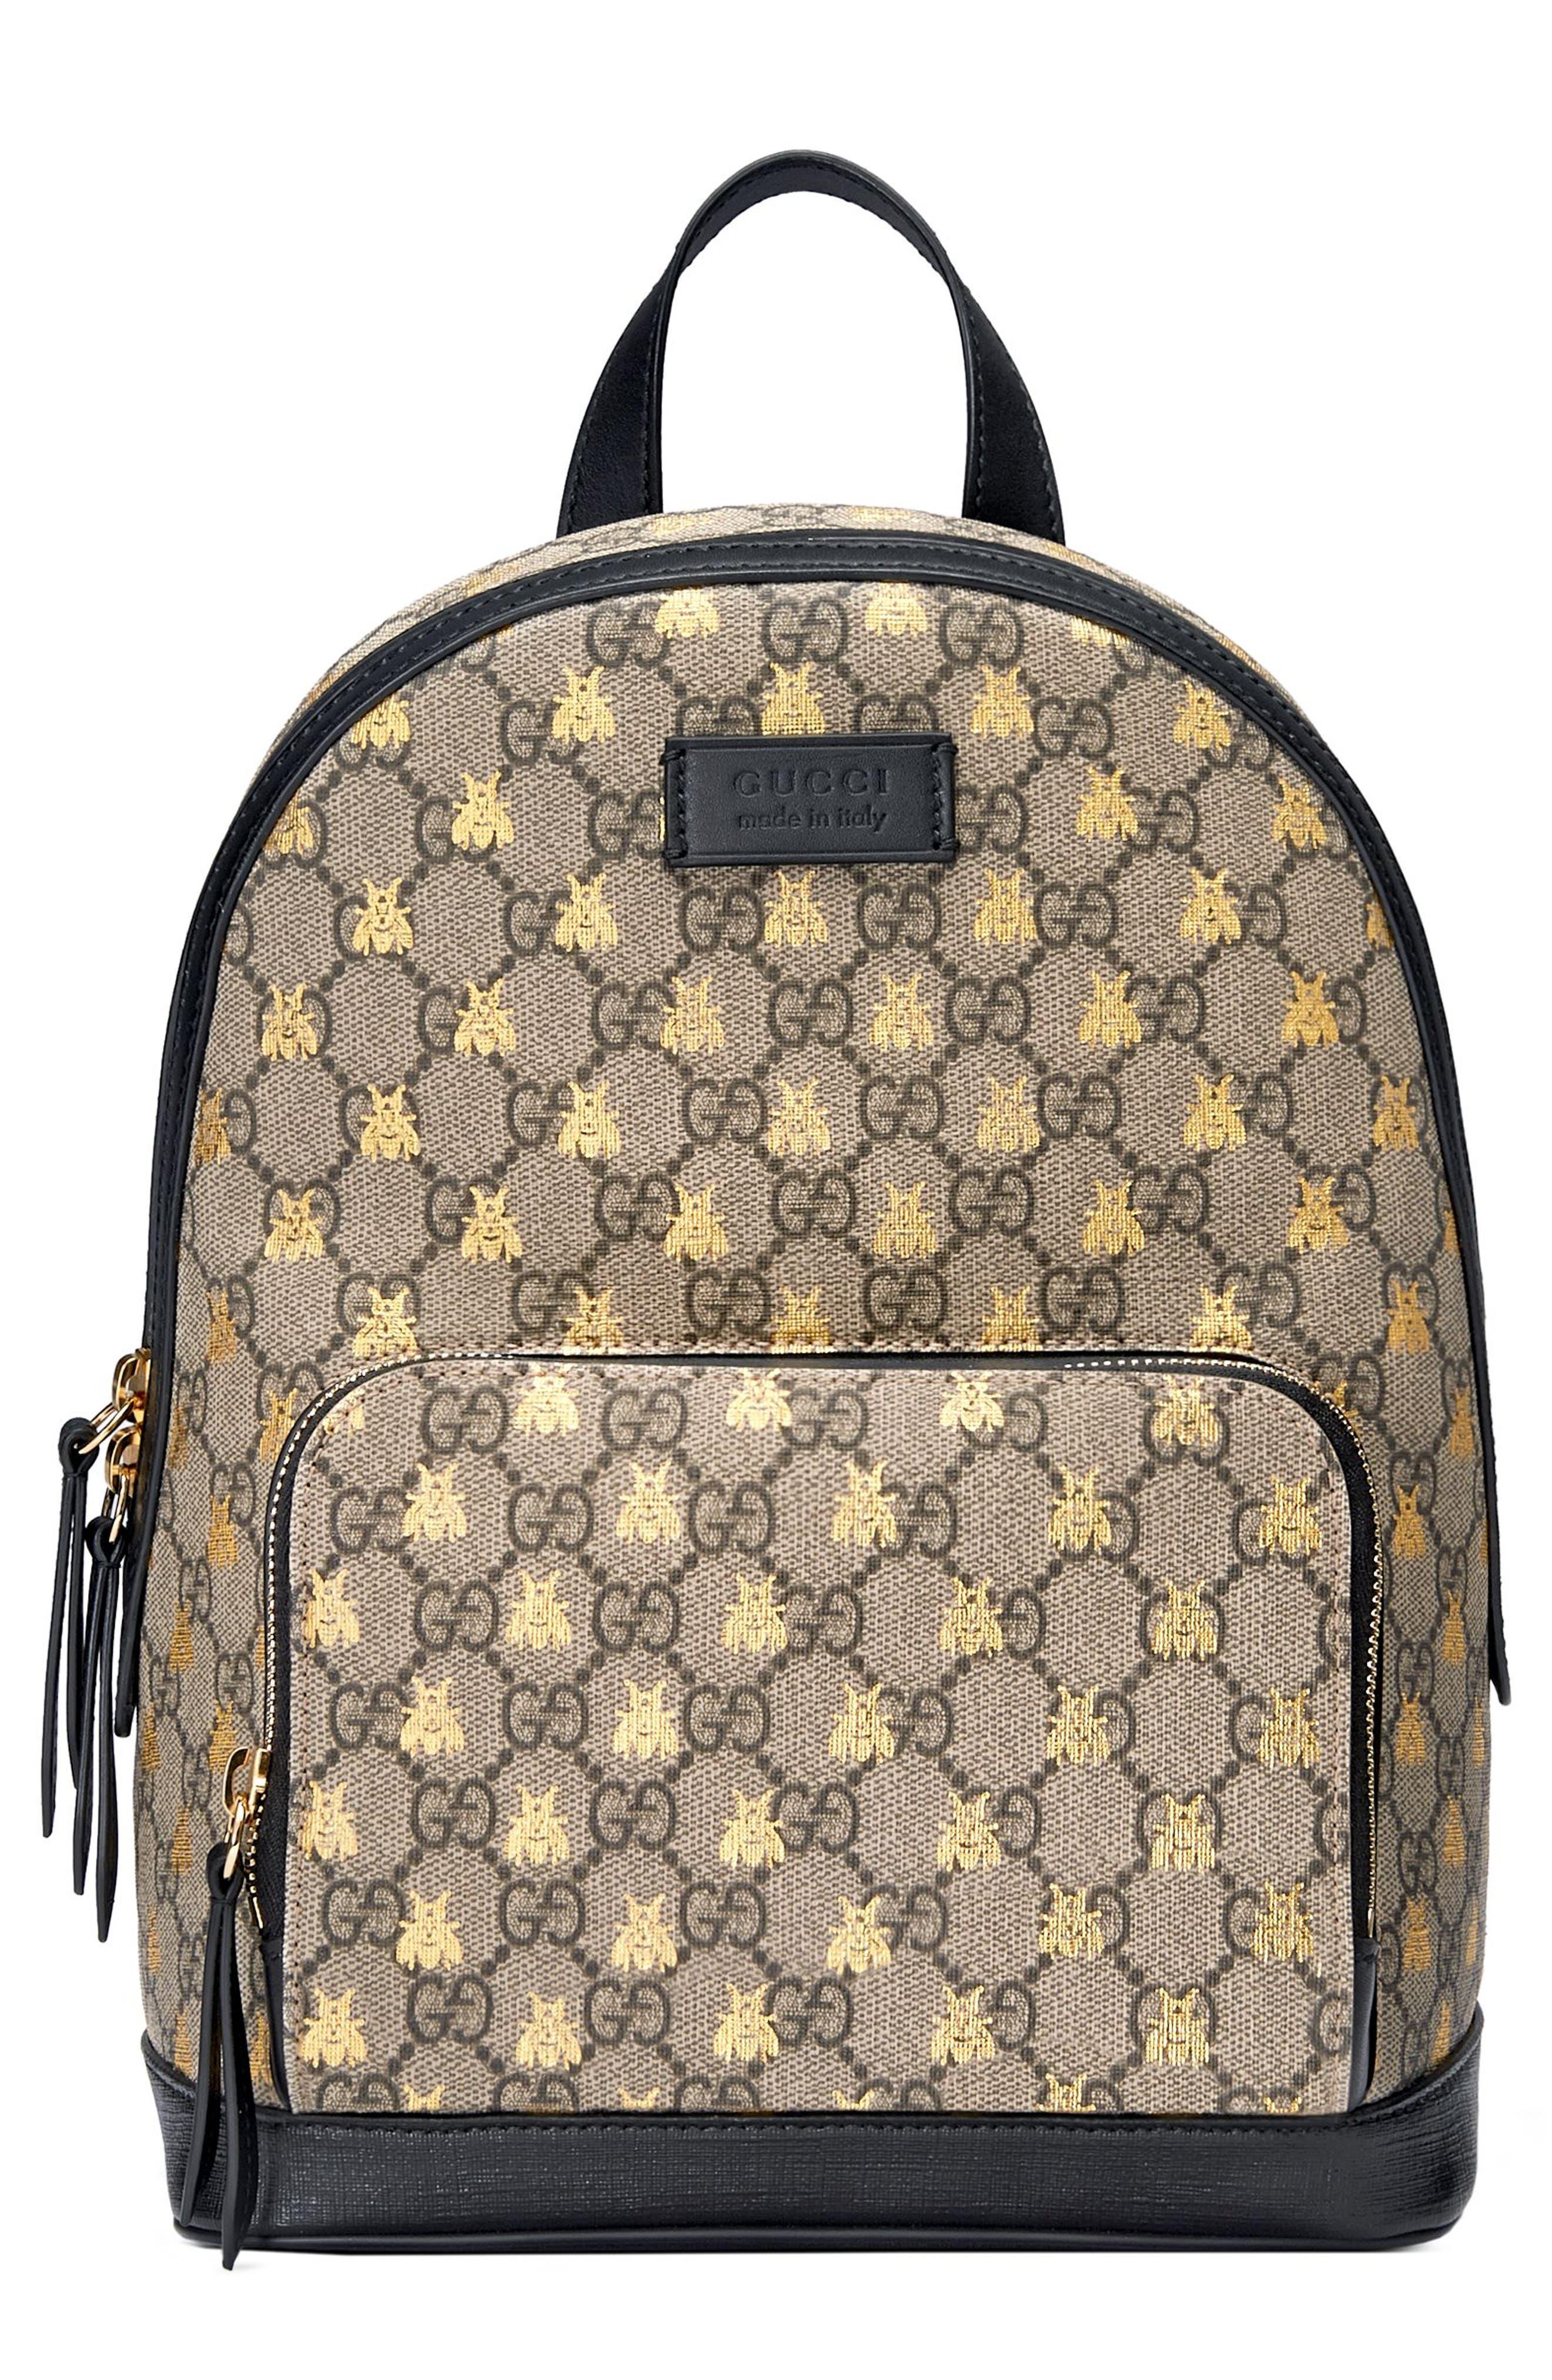 GUCCI, Bee GG Supreme Canvas Backpack, Main thumbnail 1, color, 250